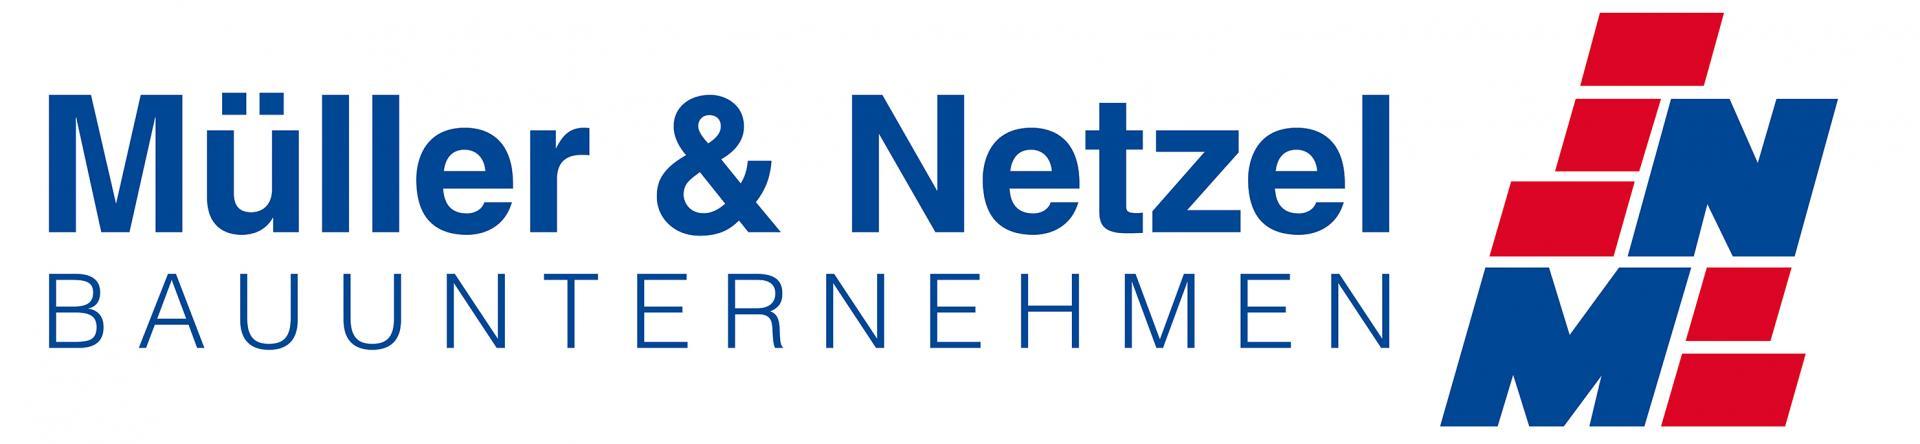 Müller & Netzel Bauunternehmen